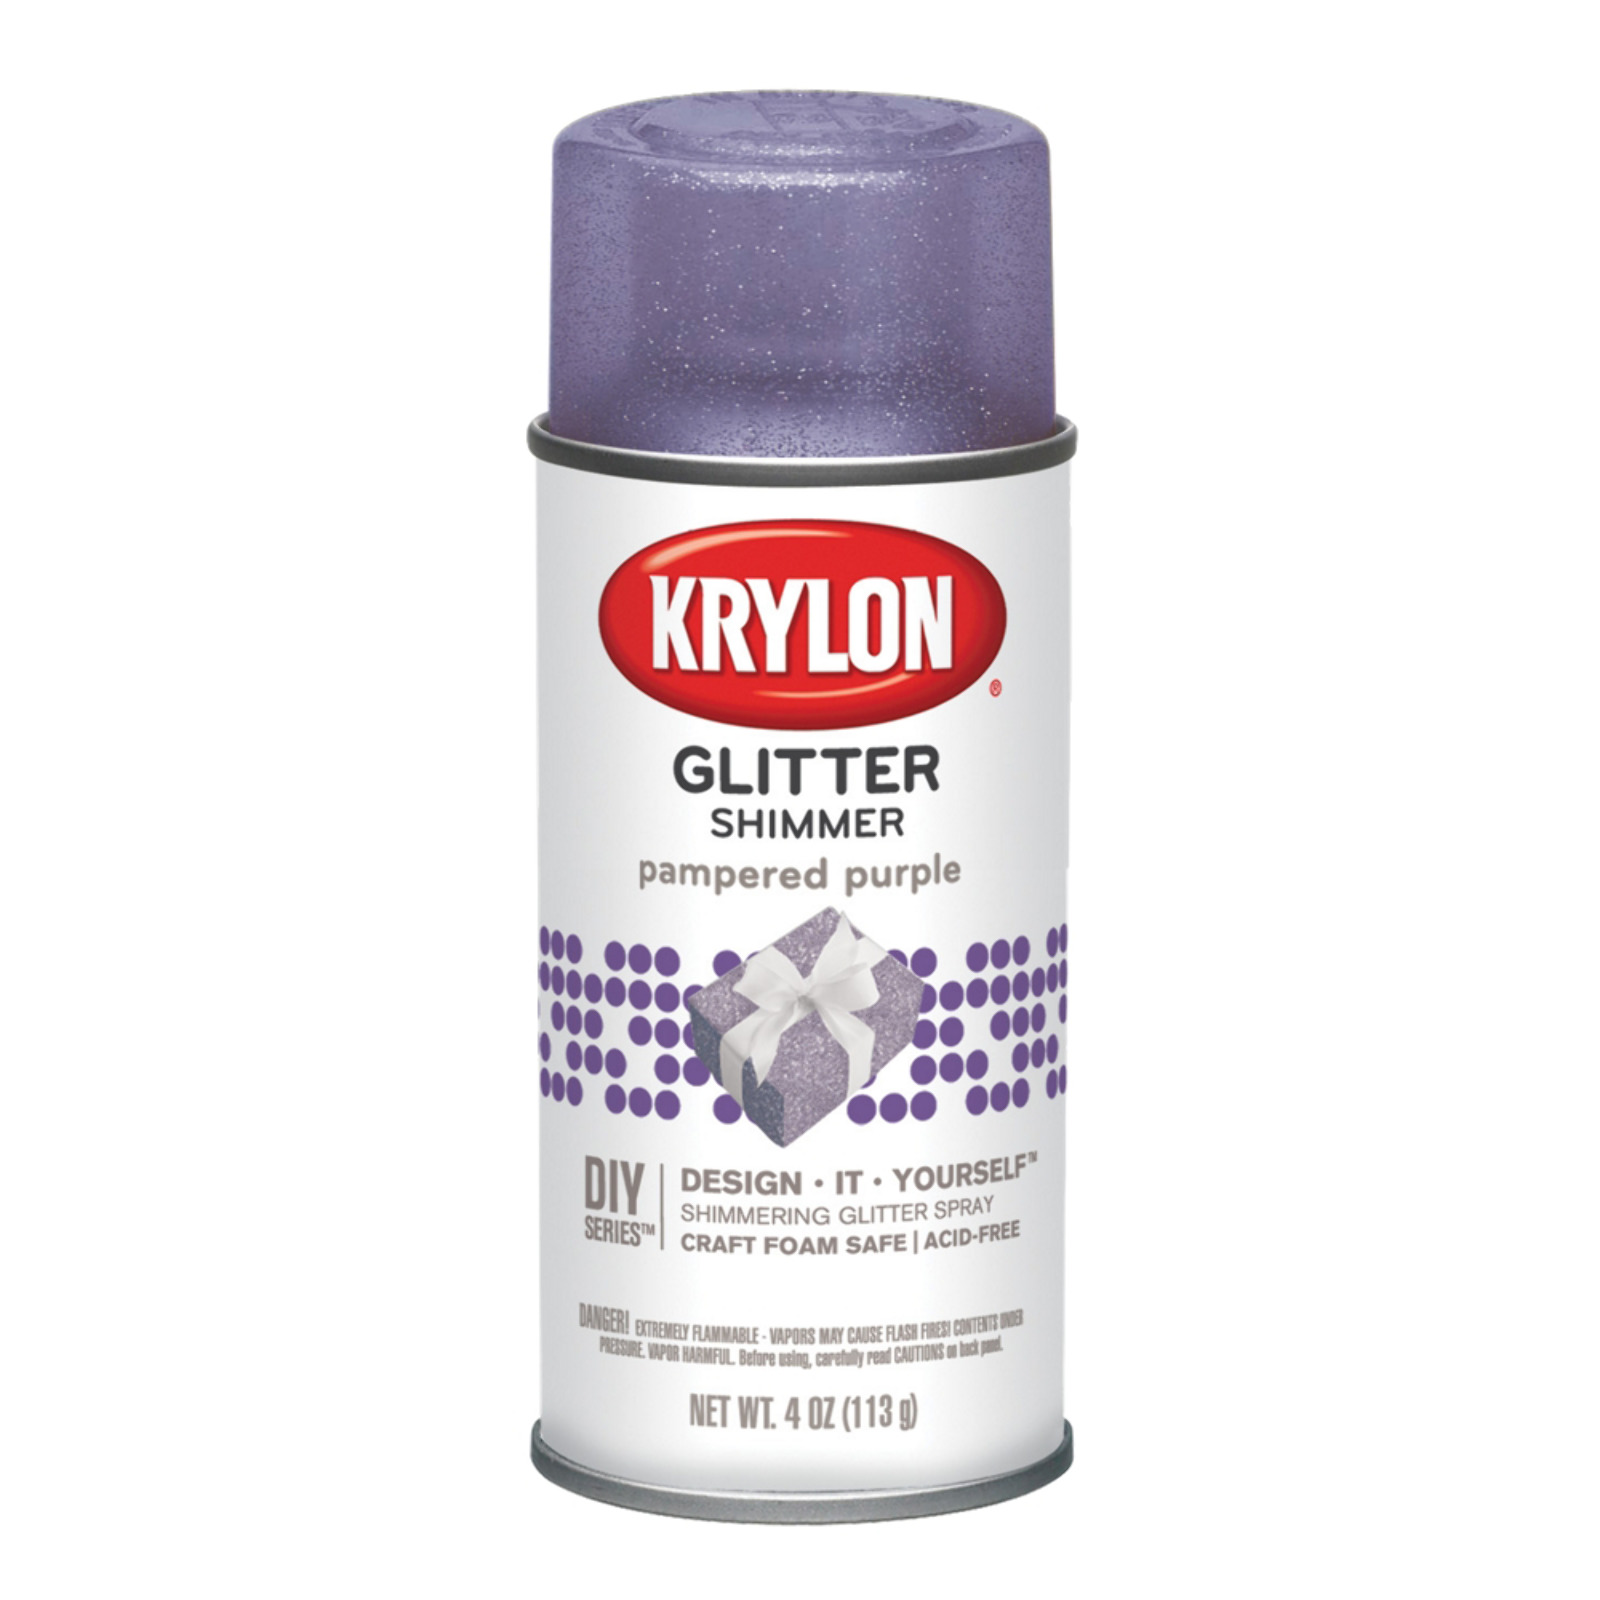 Krylon Glitter Shimmer Spray Paint, 4 oz., Purple